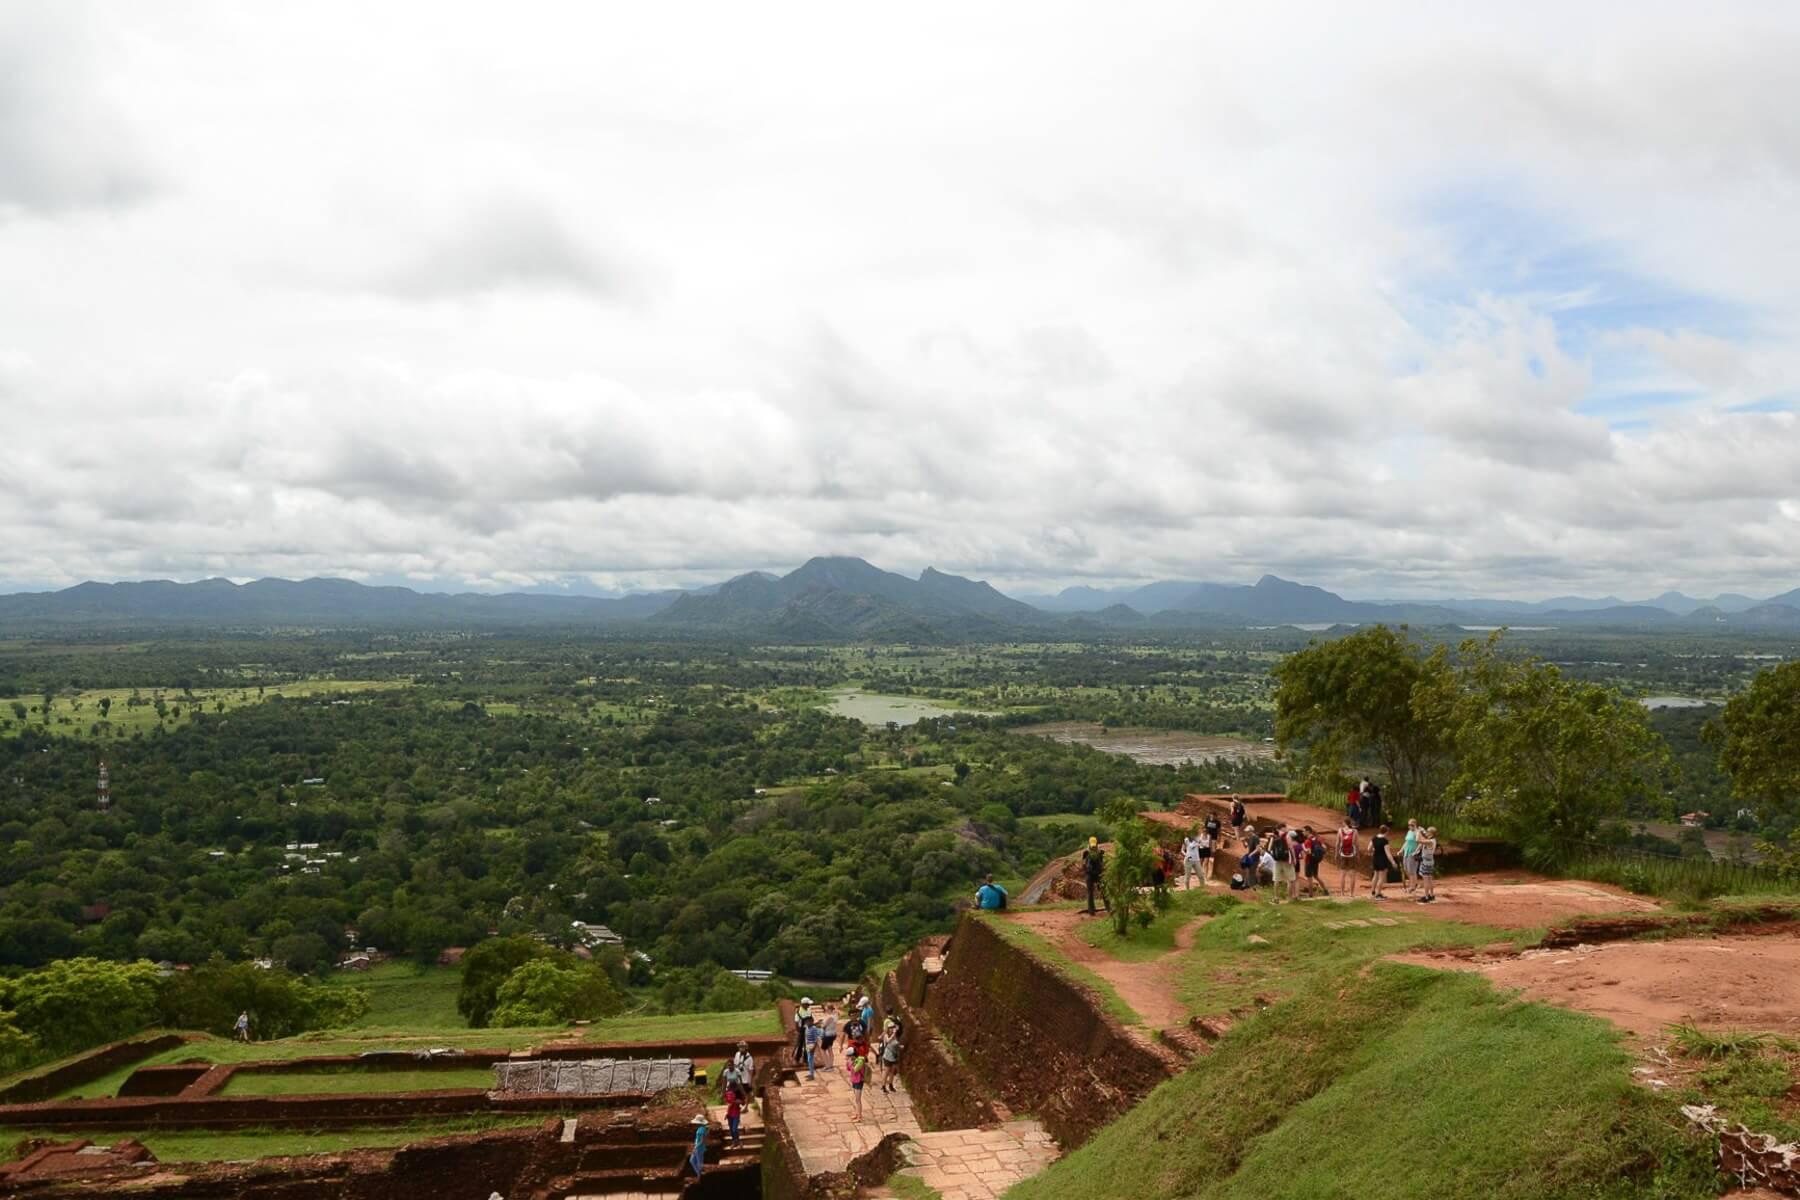 Aussicht vom Plateau des Löwenfelsens